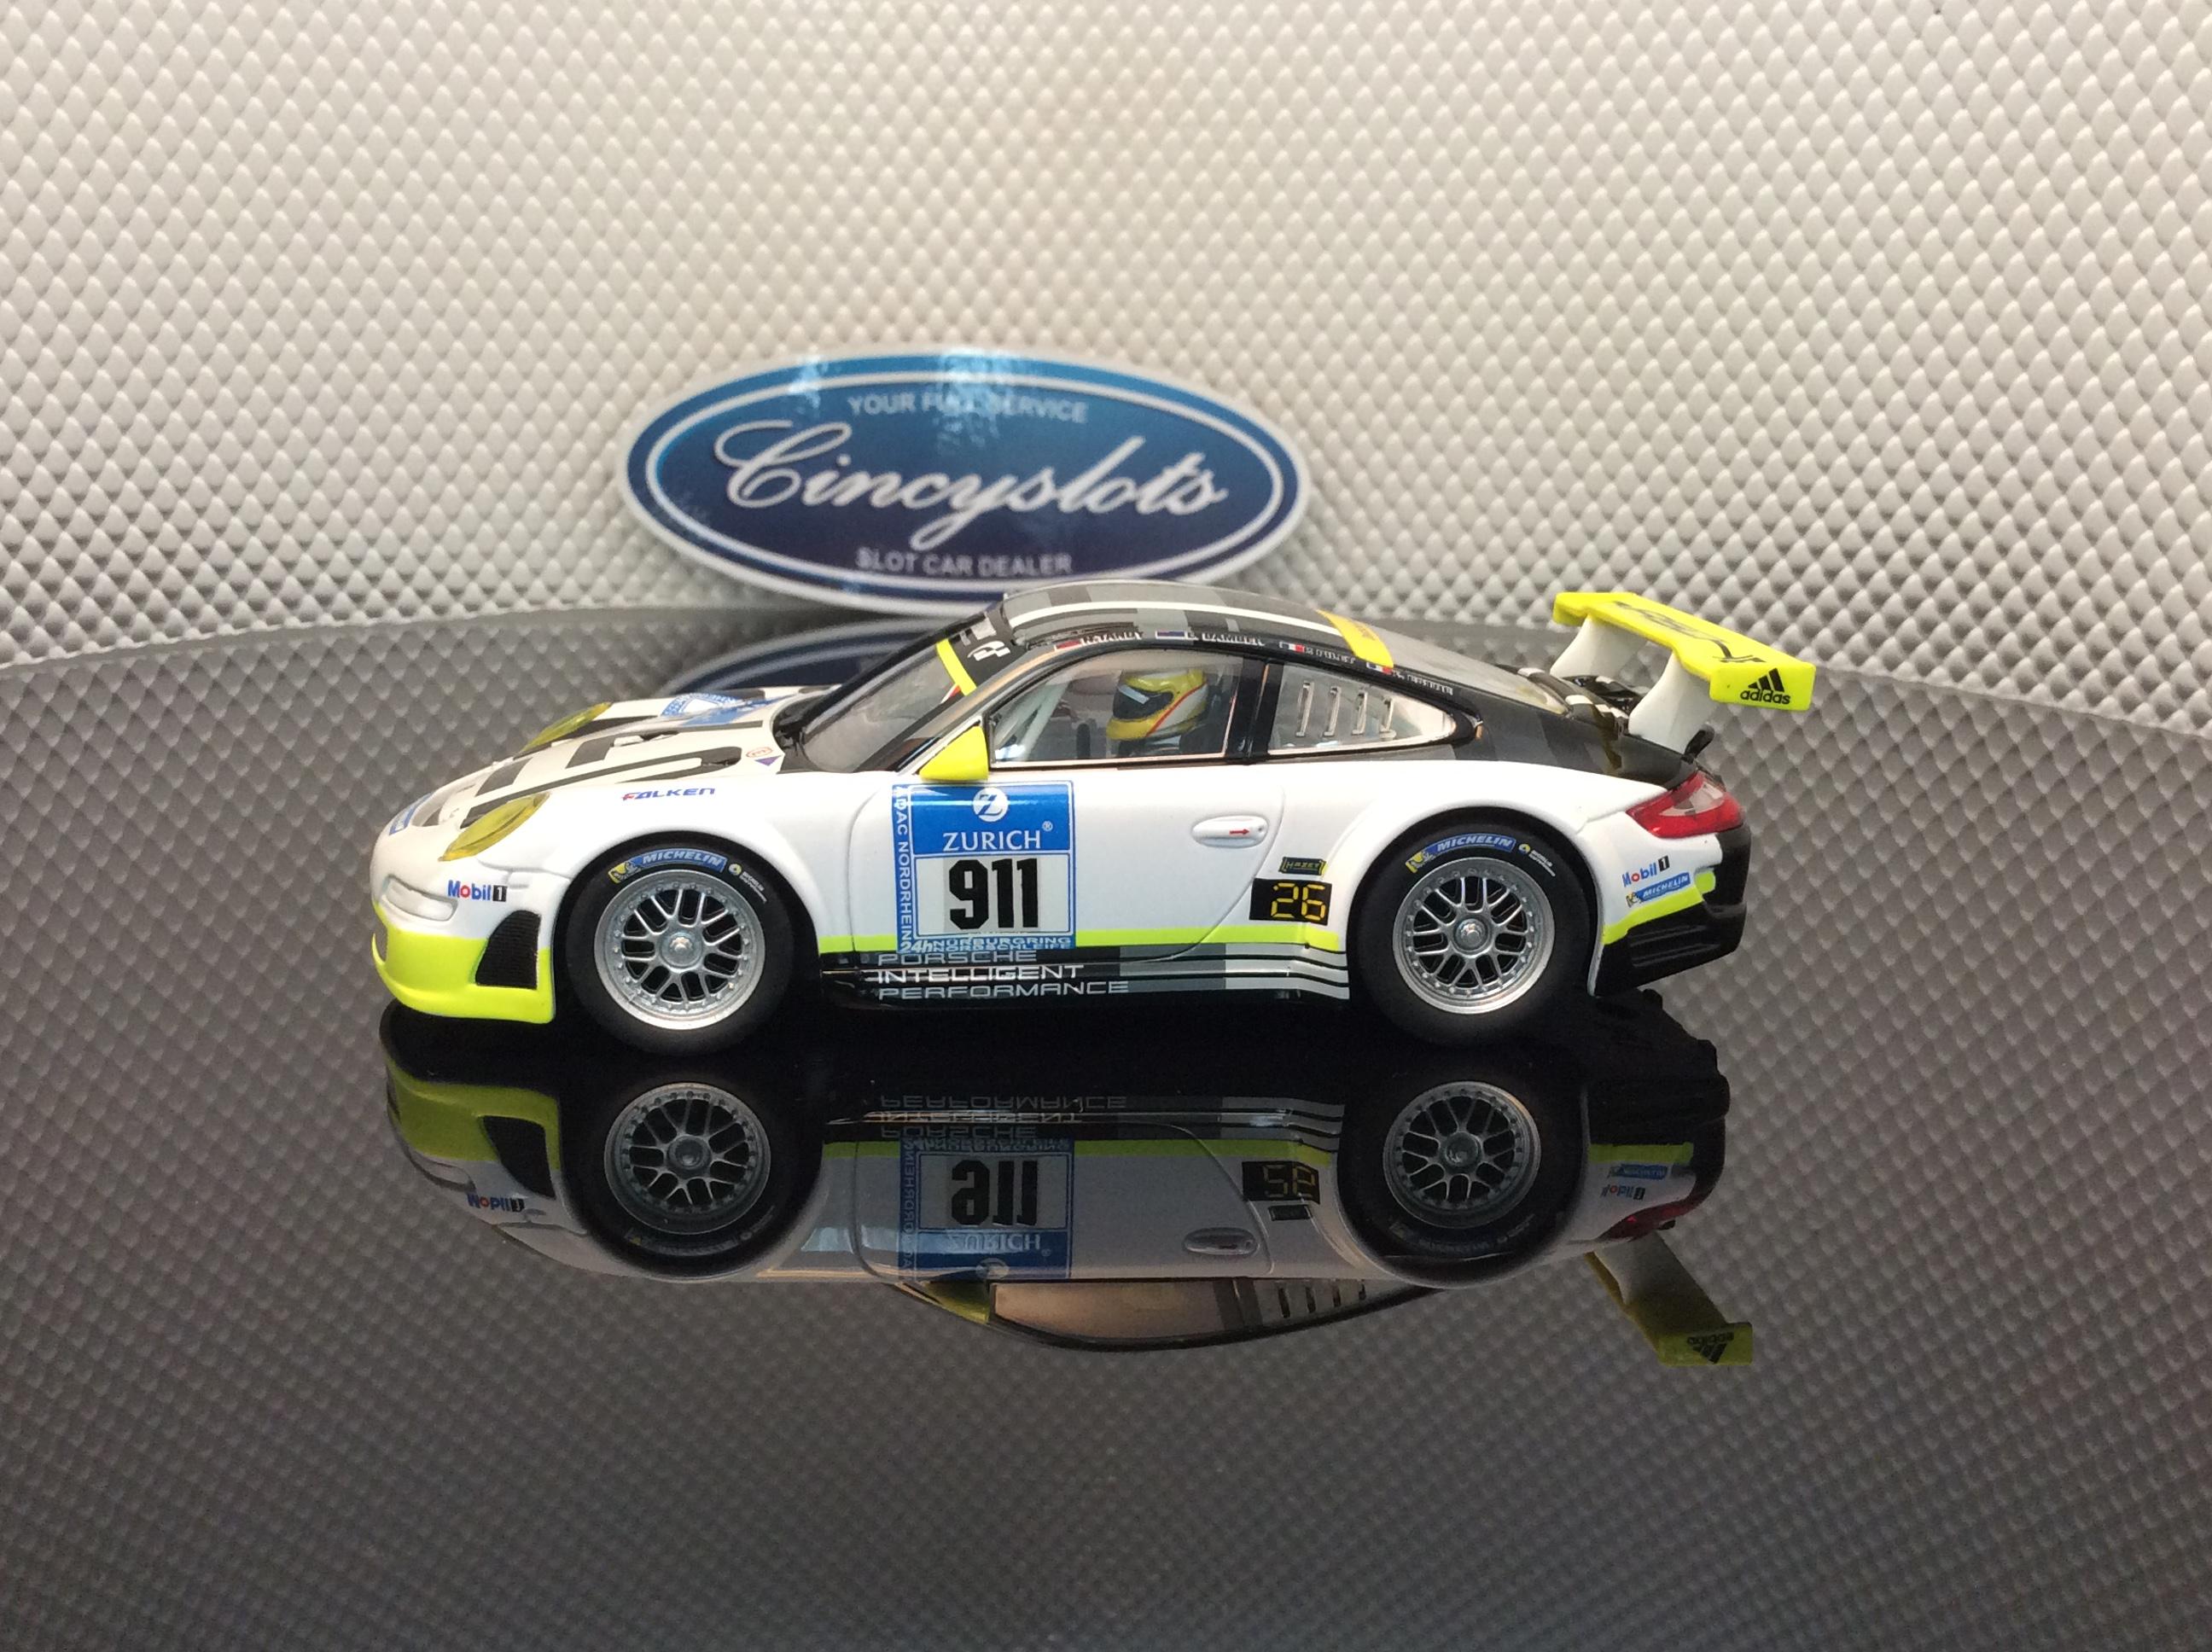 carrera d132 30780 porsche 911 gt3 rsr manthey racing slot car. Black Bedroom Furniture Sets. Home Design Ideas